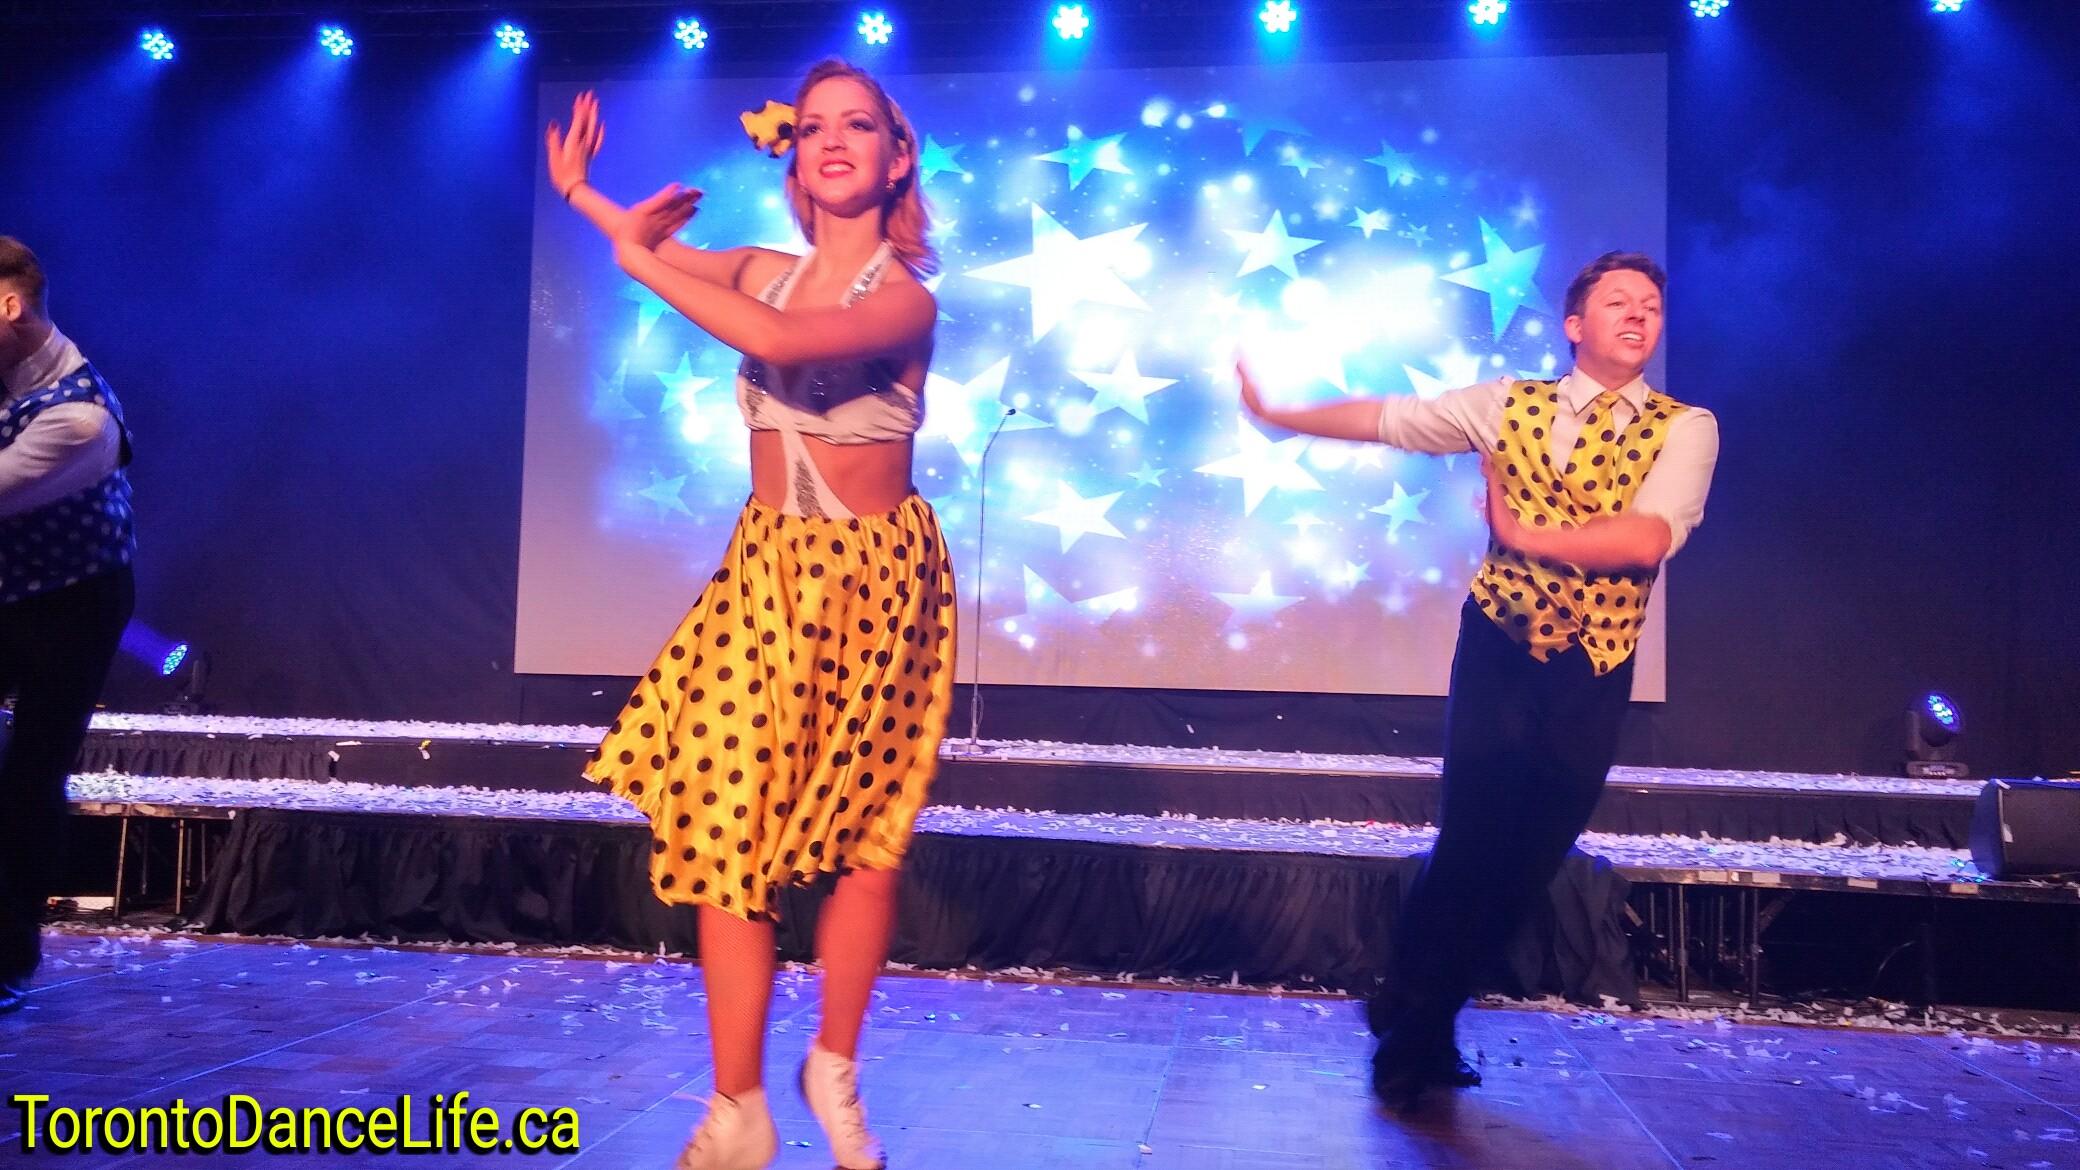 Disco dance performance